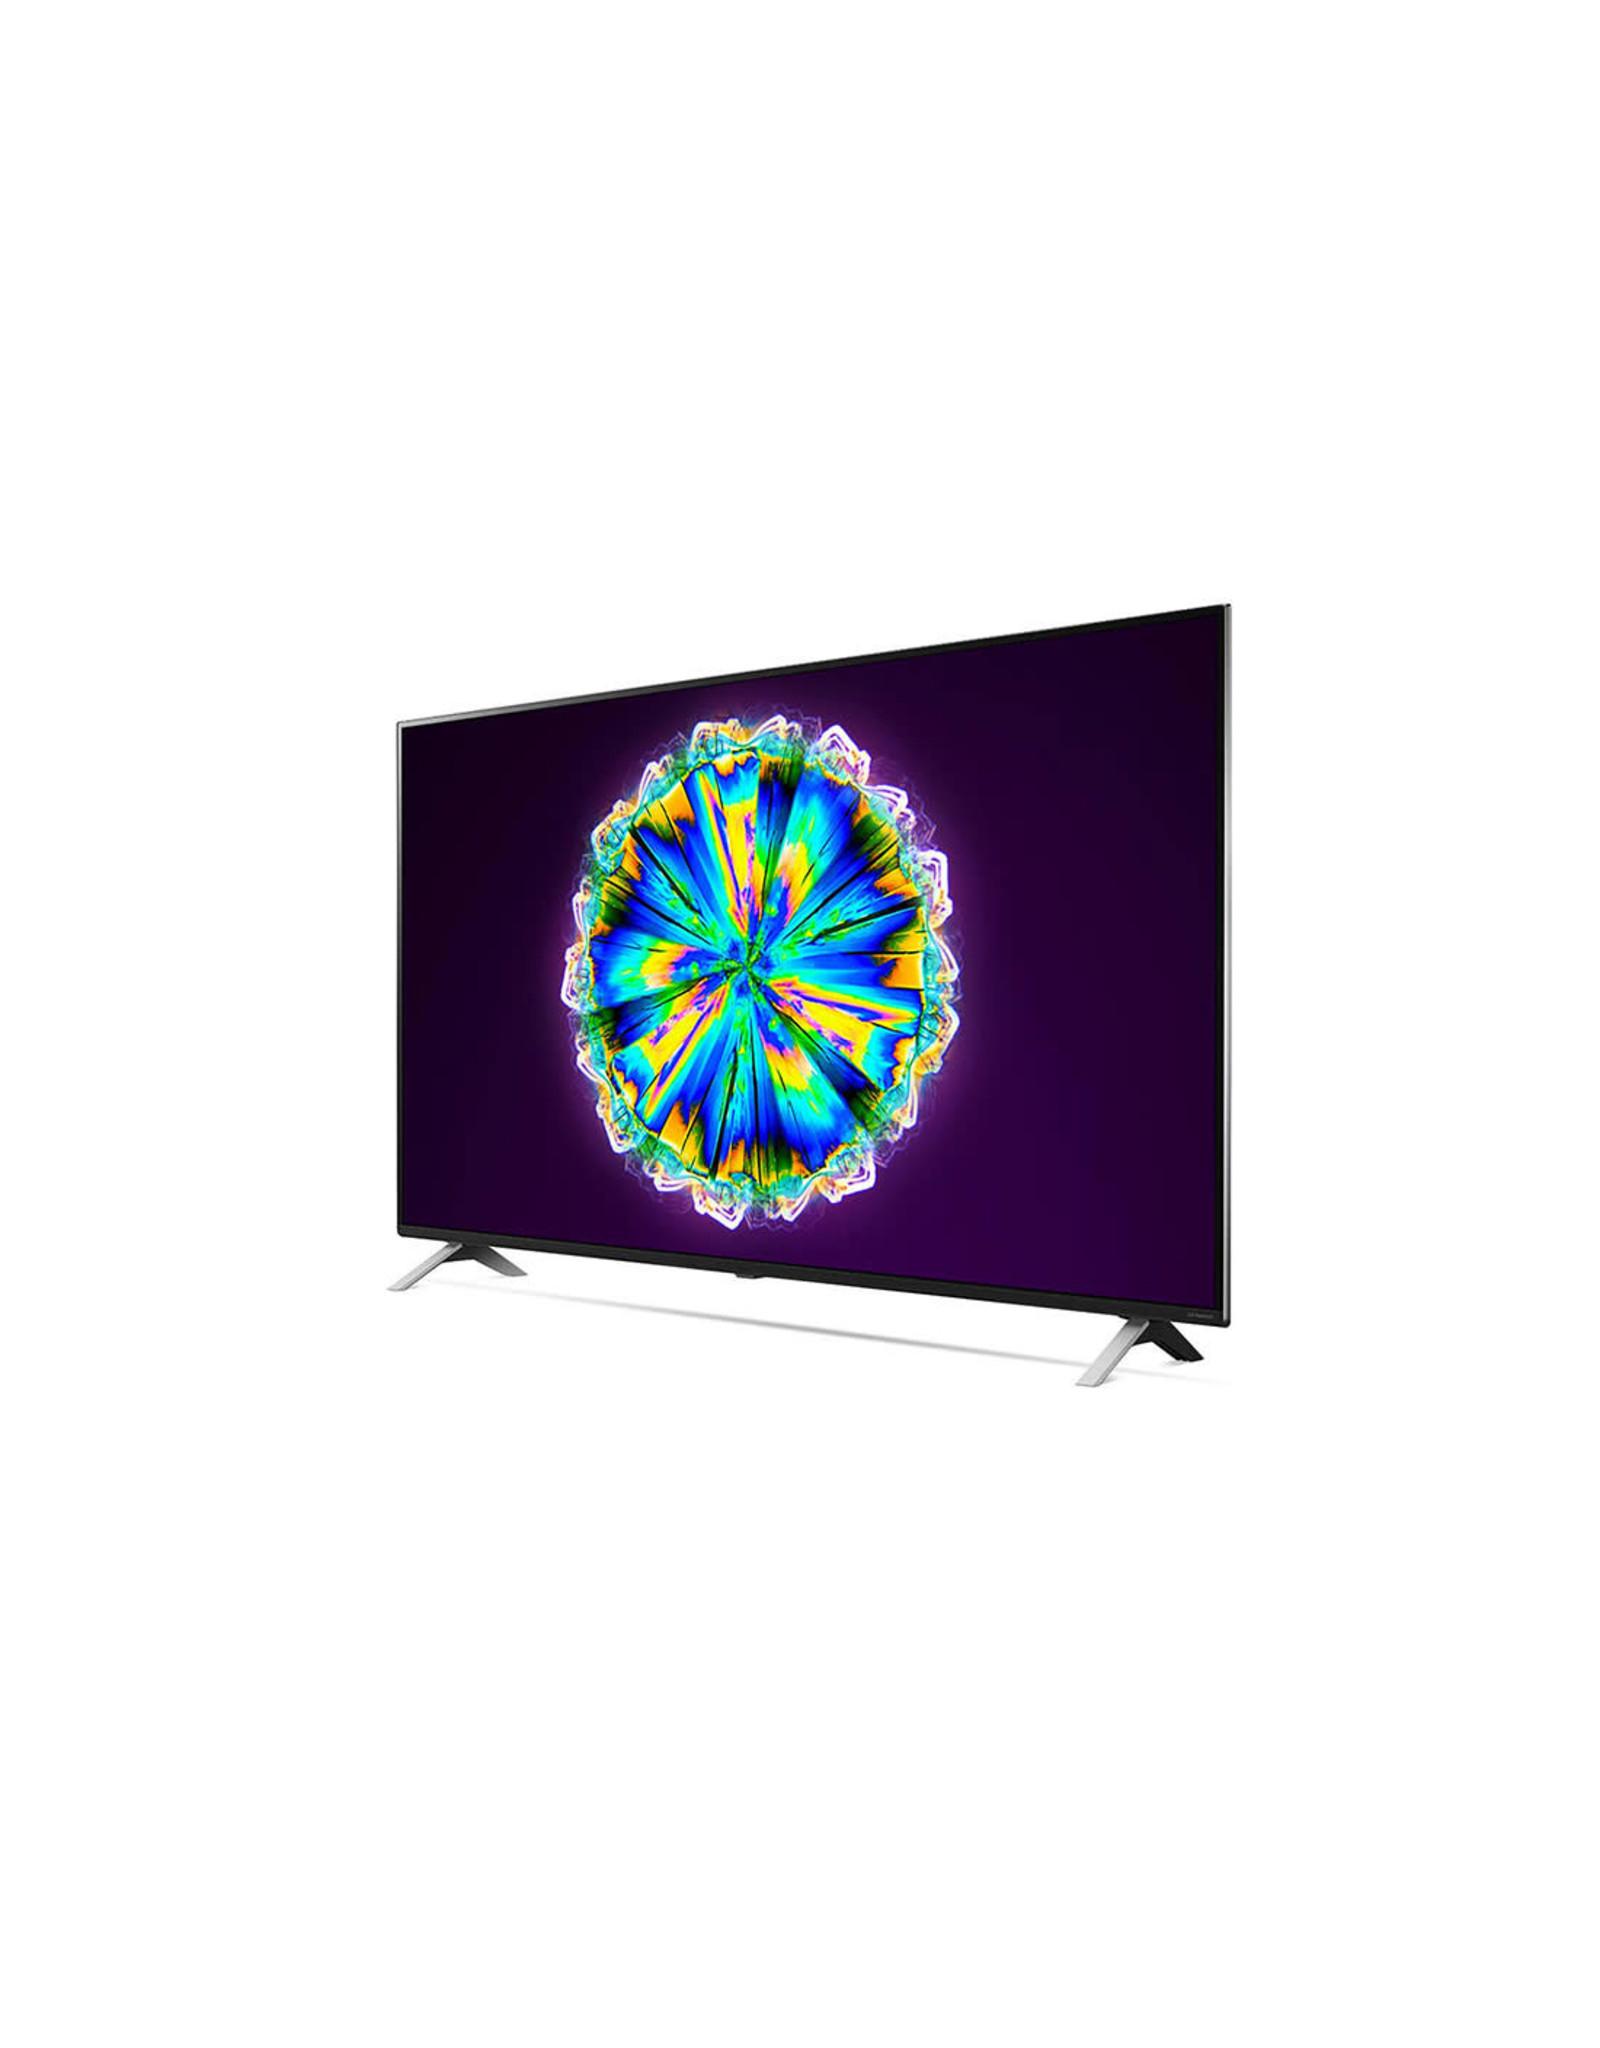 LG Electronics LG NanoCell 85 Series 2020 75 inch Class 4K Smart UHD NanoCell TV w/ AI ThinQ® (74.5'' Diag)